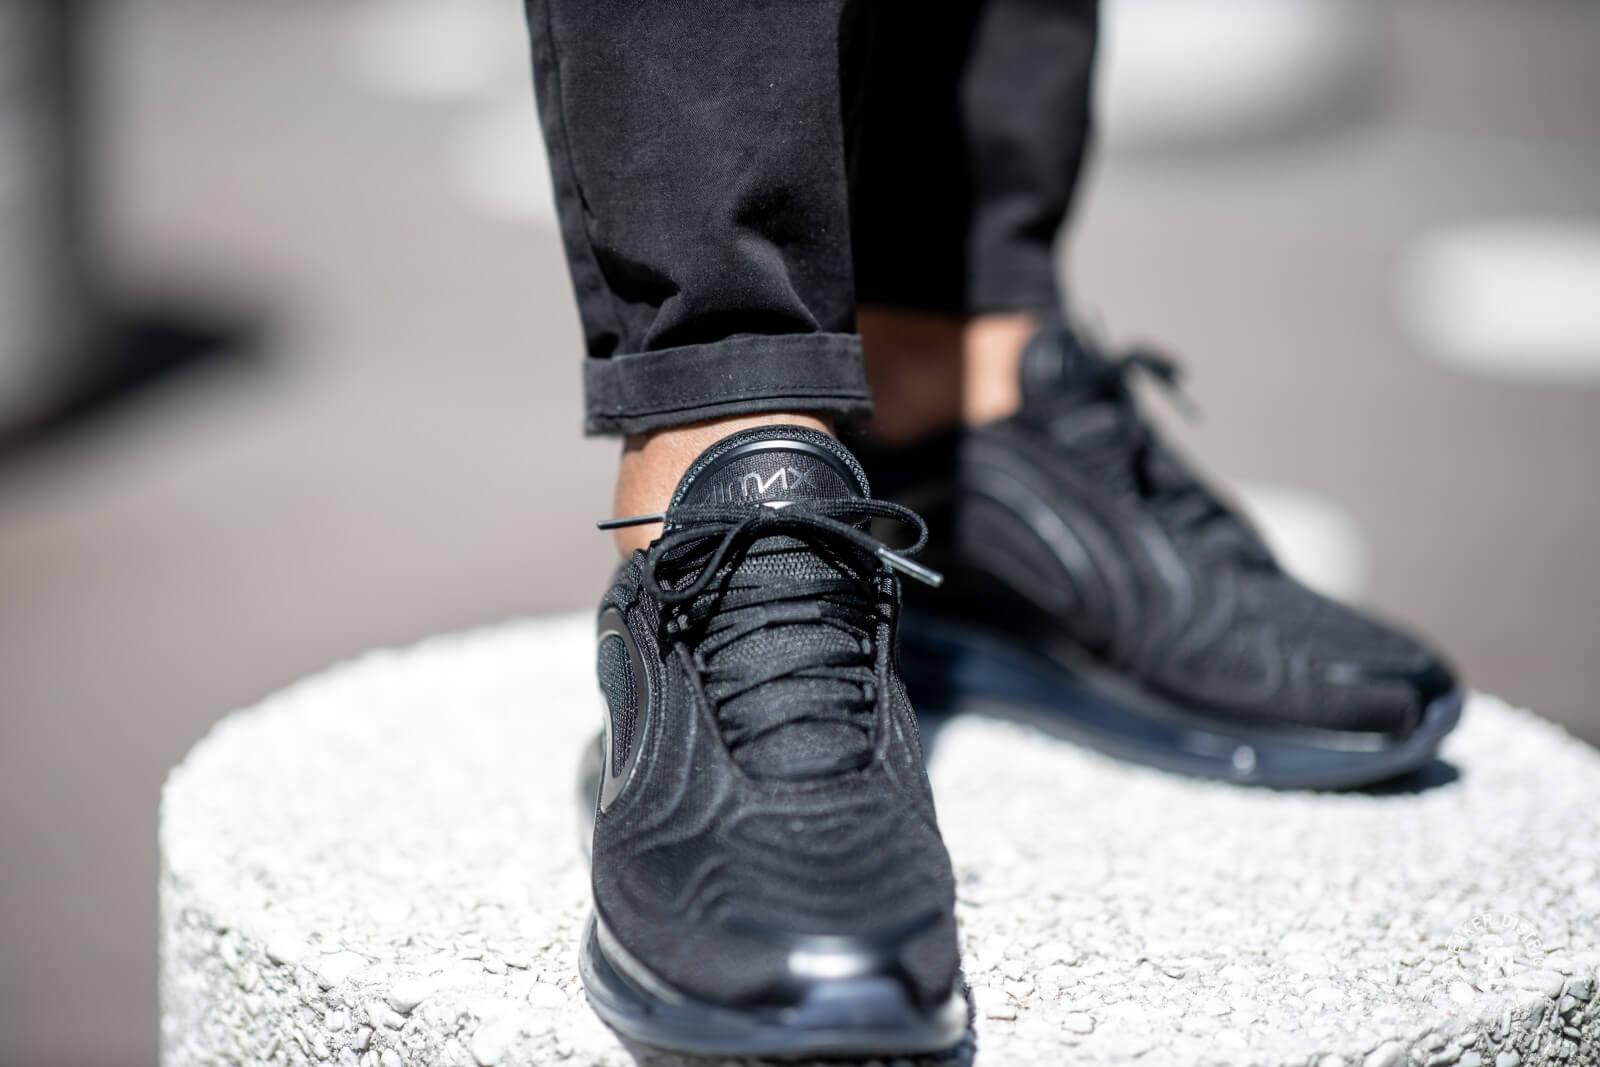 Nike Air Max 720 Black/Anthracite